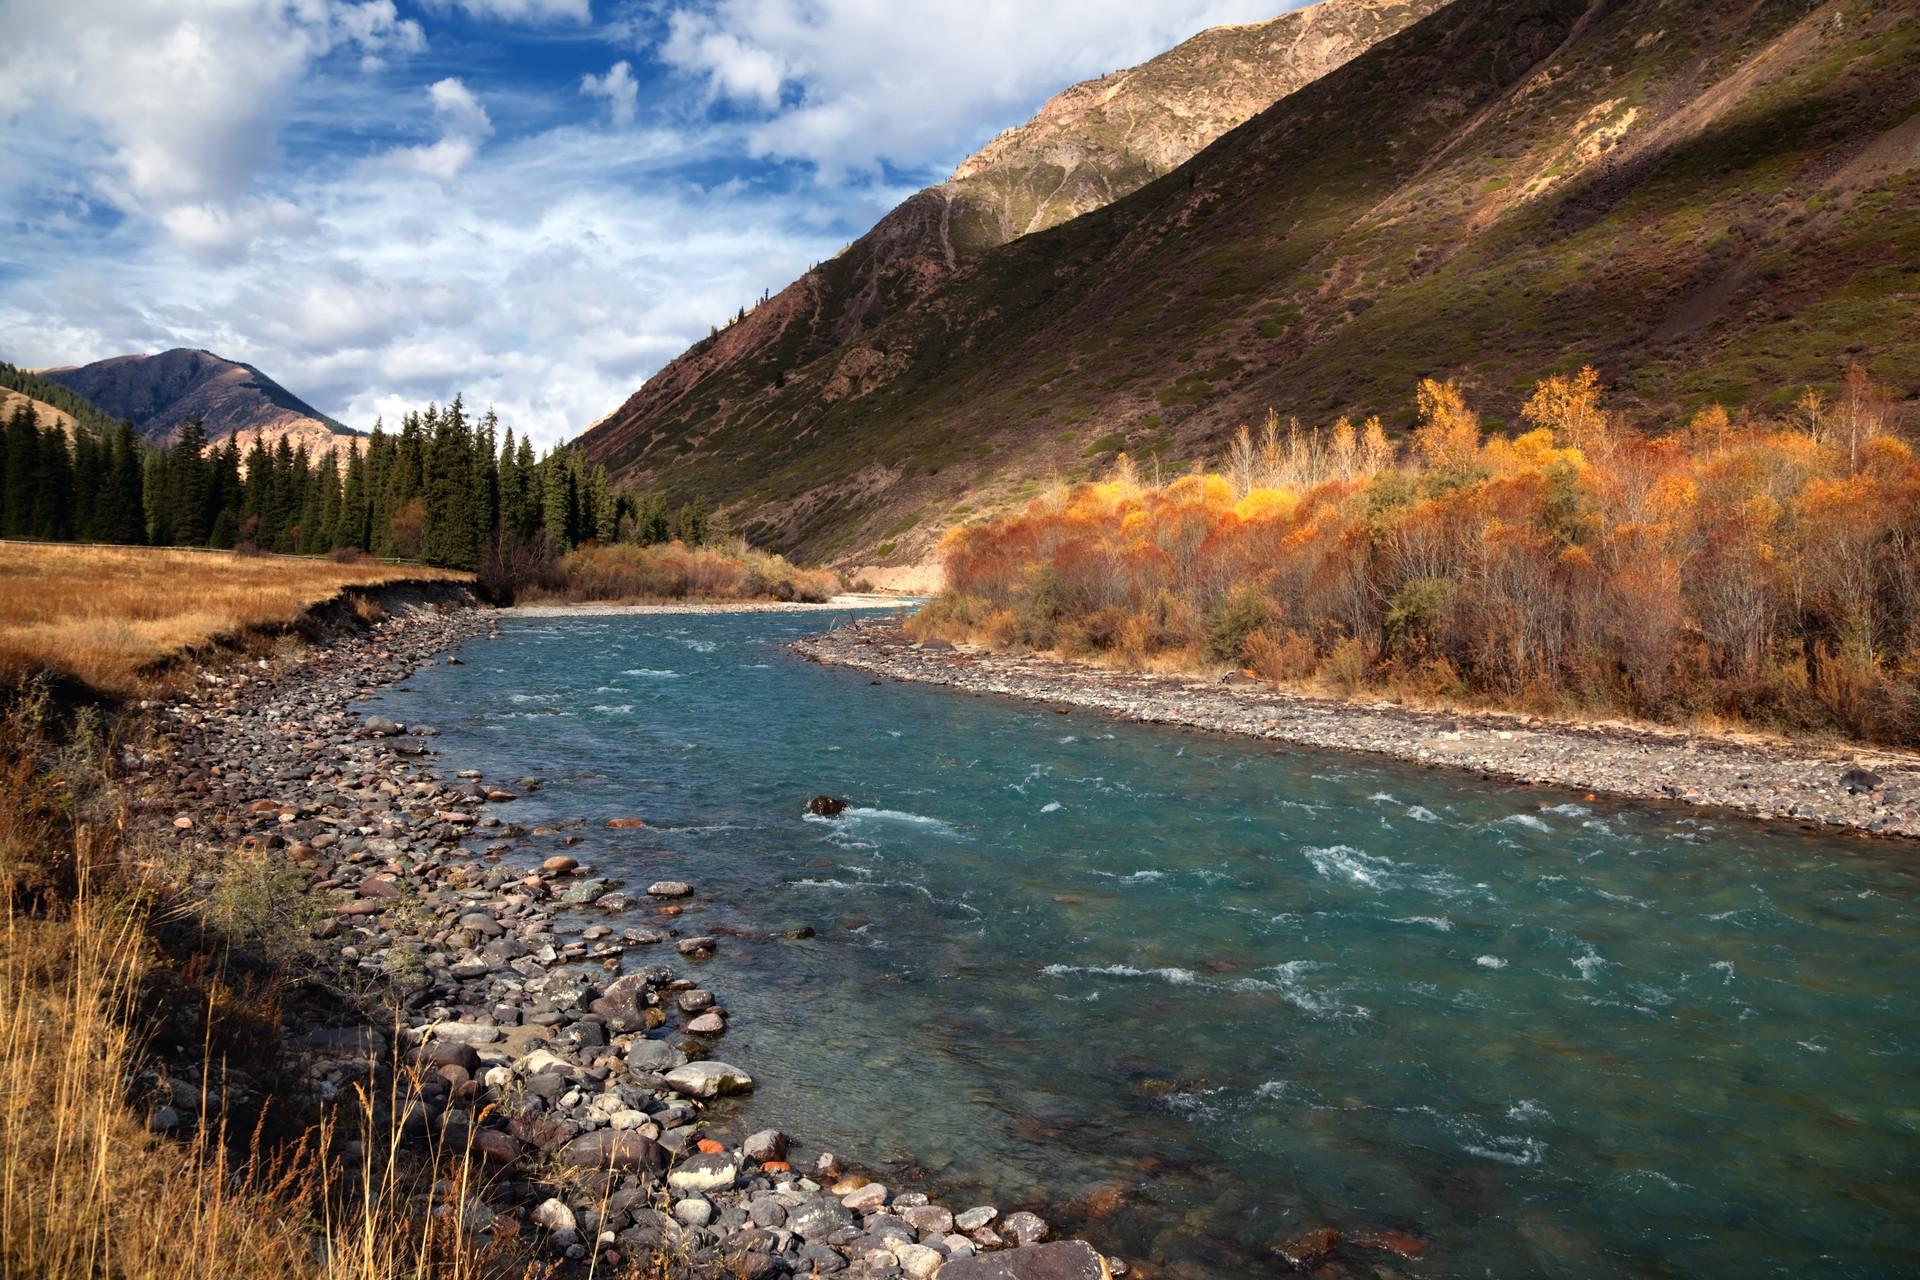 Chilik River in Tien Shan Mountains Kazakhstan